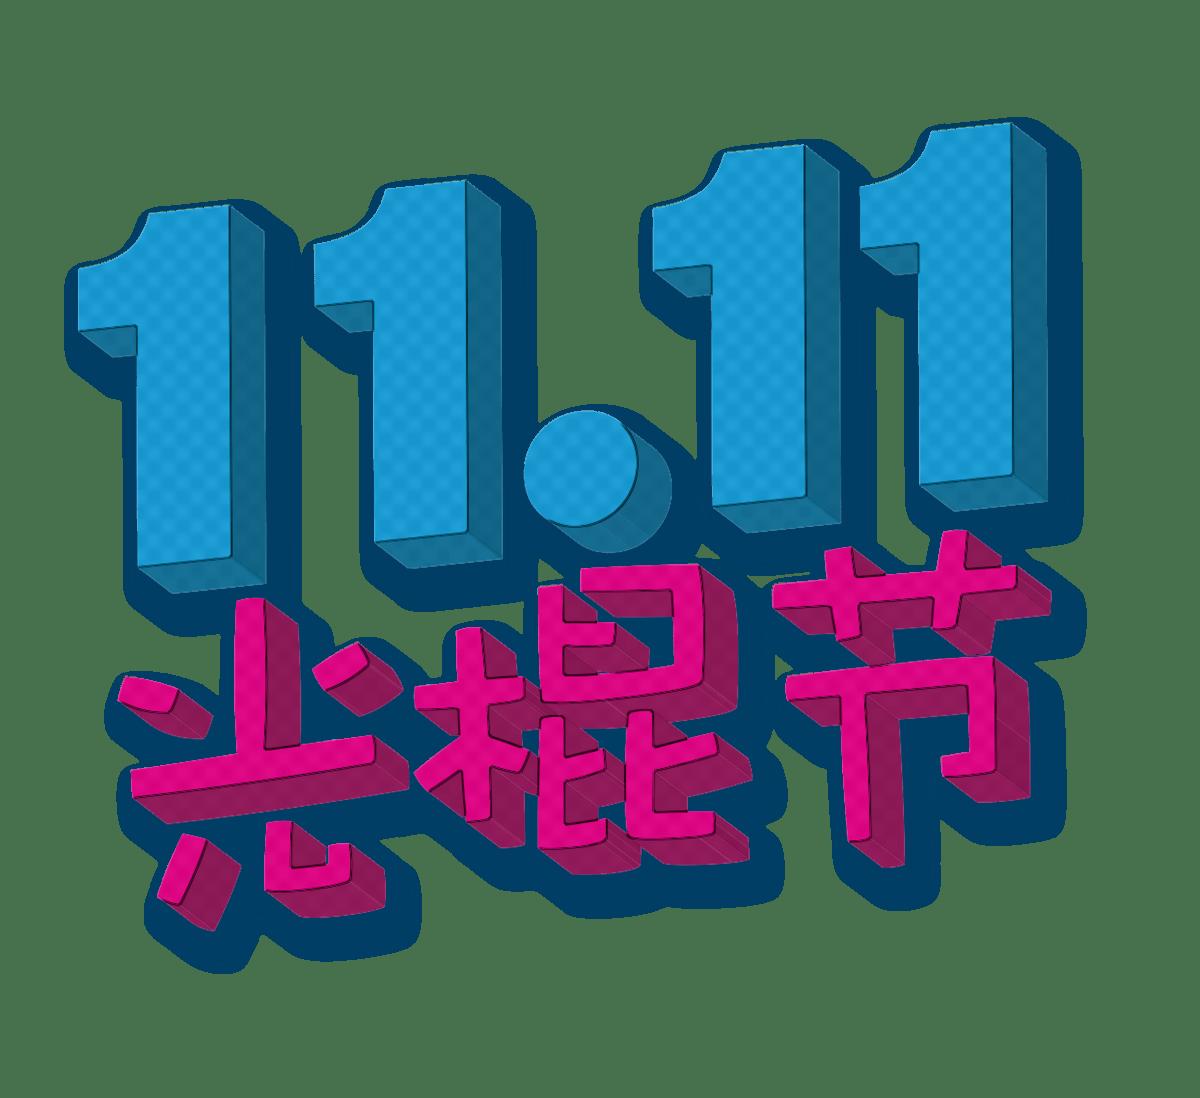 chinese calendar november 2019